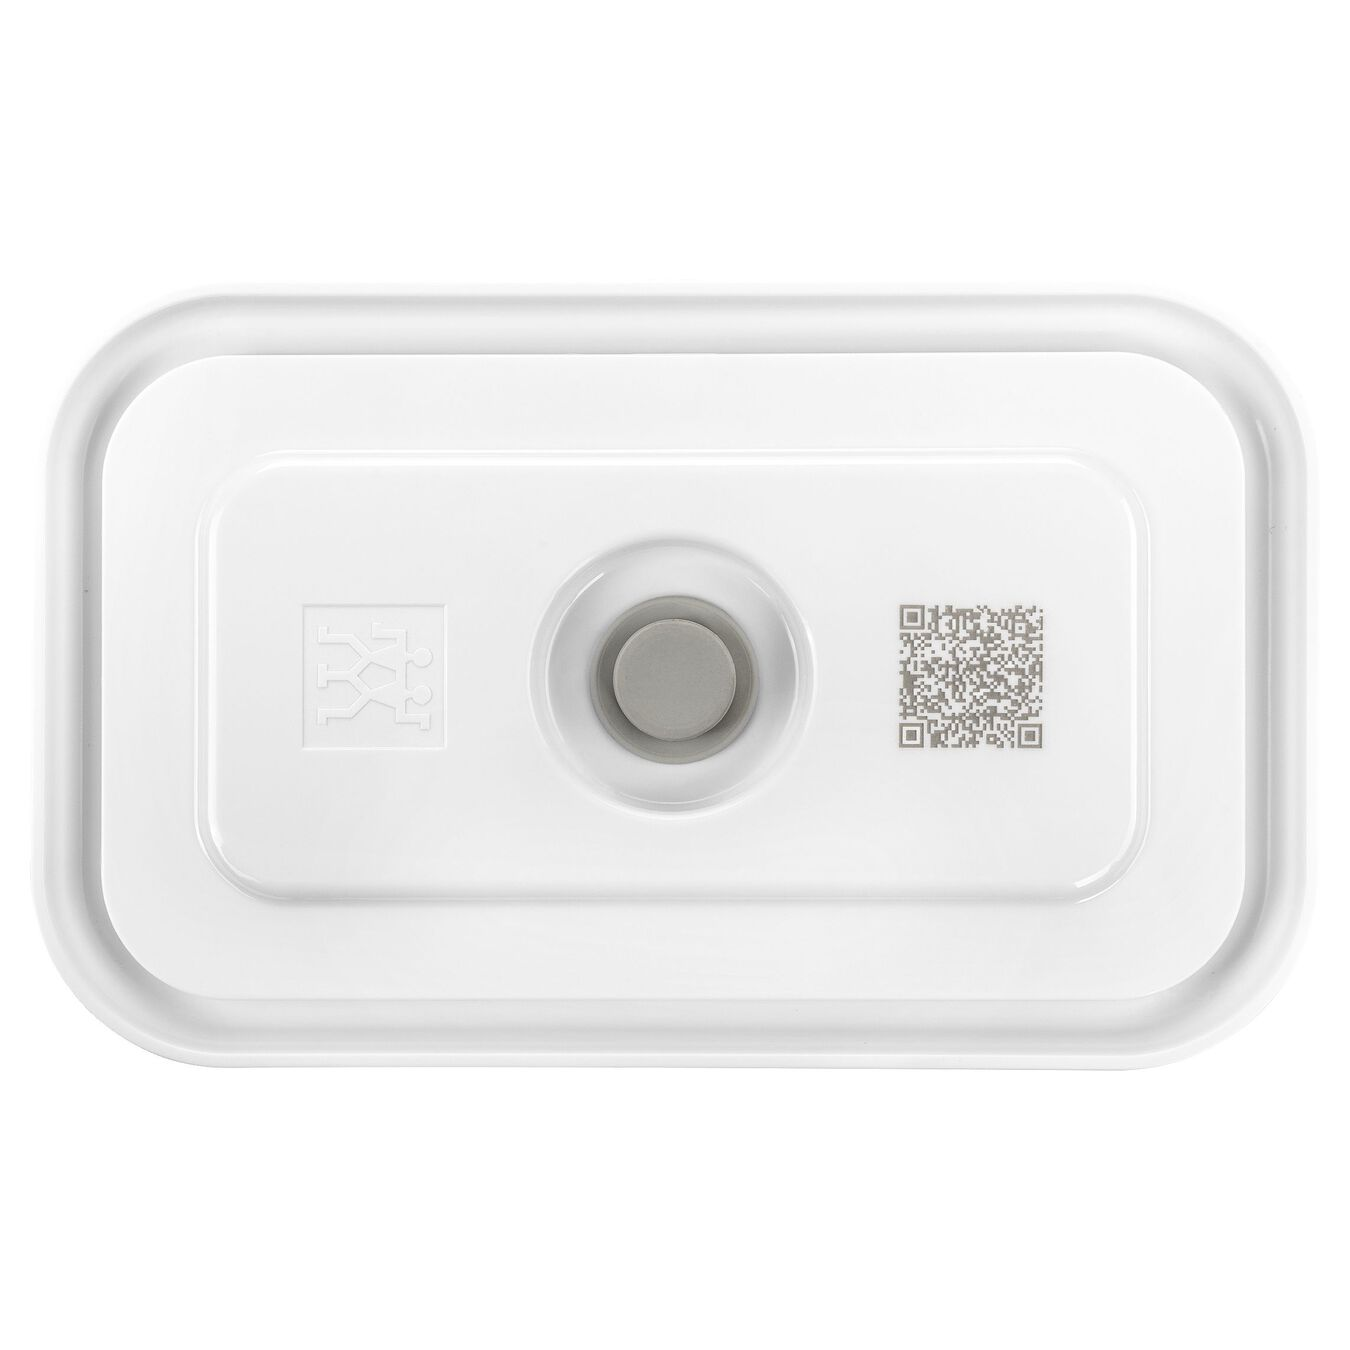 Vakuumbeholder - M - Plastik - Semitransparent-Grå,,large 2